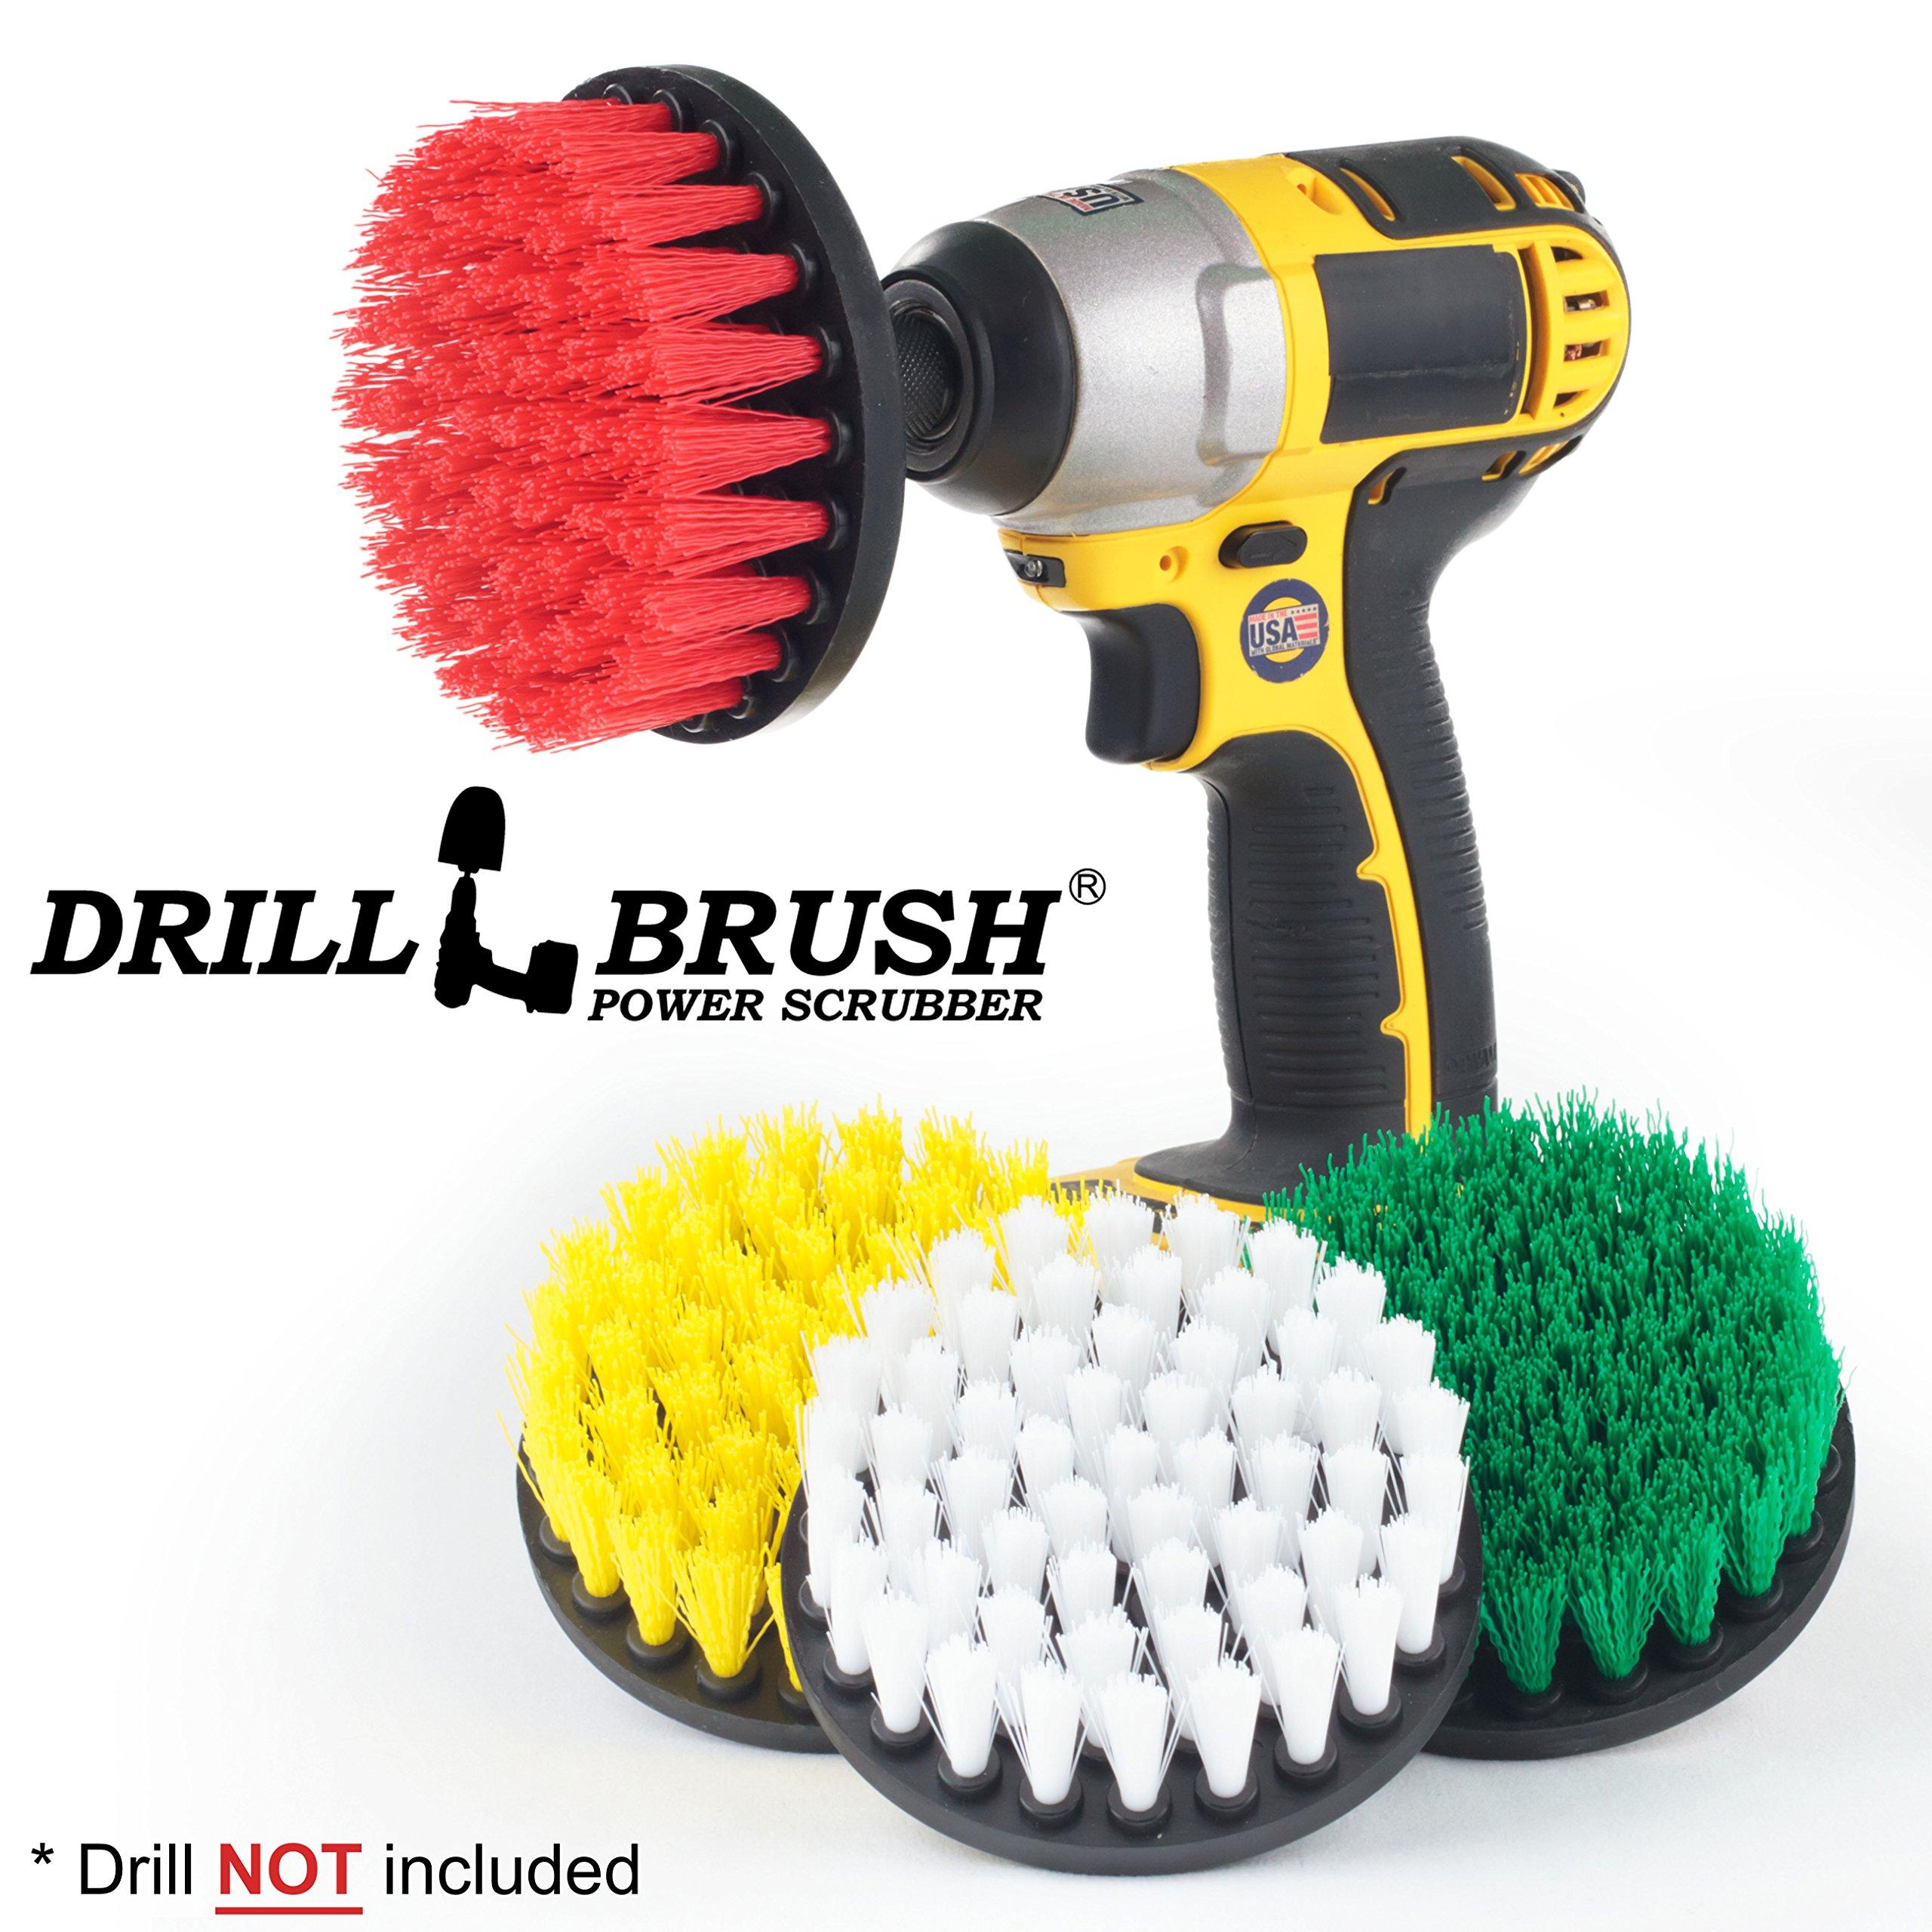 Drill Brush/Scrub Brush/Power Scrubber 4 piece Kit/Multi Application Variety Kit